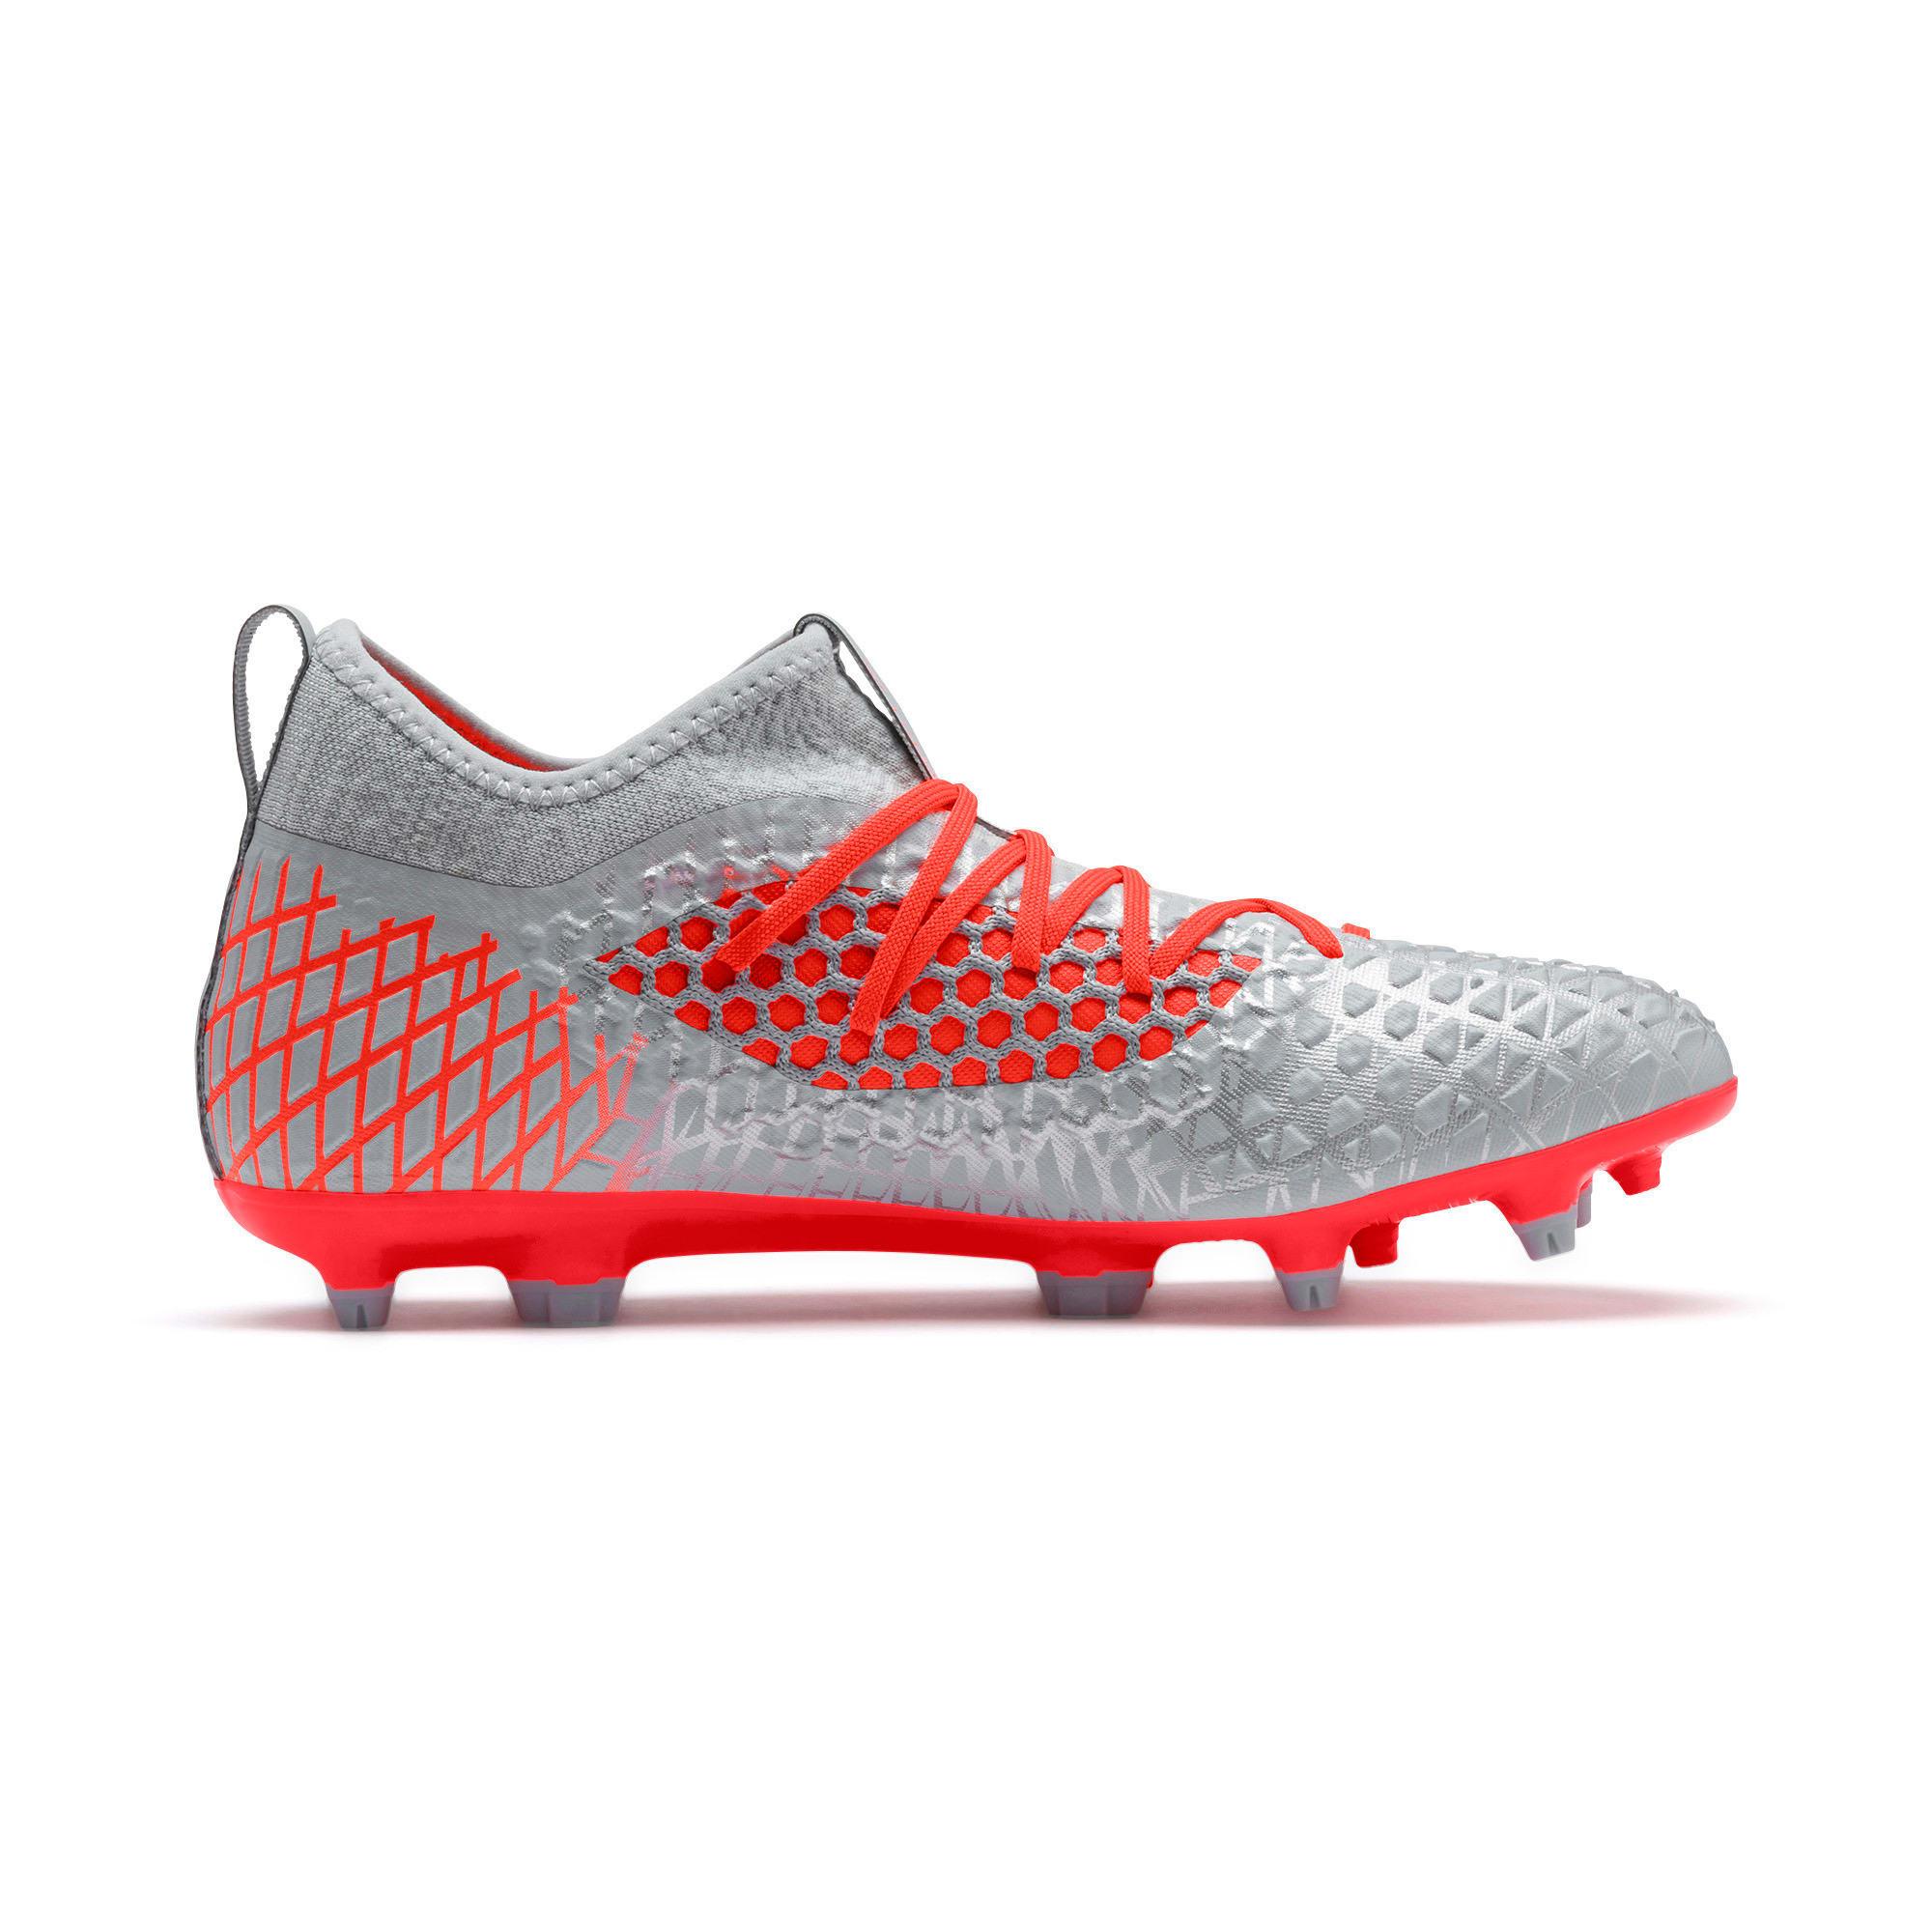 Anteprima 6 di FUTURE 4.3 NETFIT FG/AG Men's Football Boots, Glacial Blue-Nrgy Red, medio